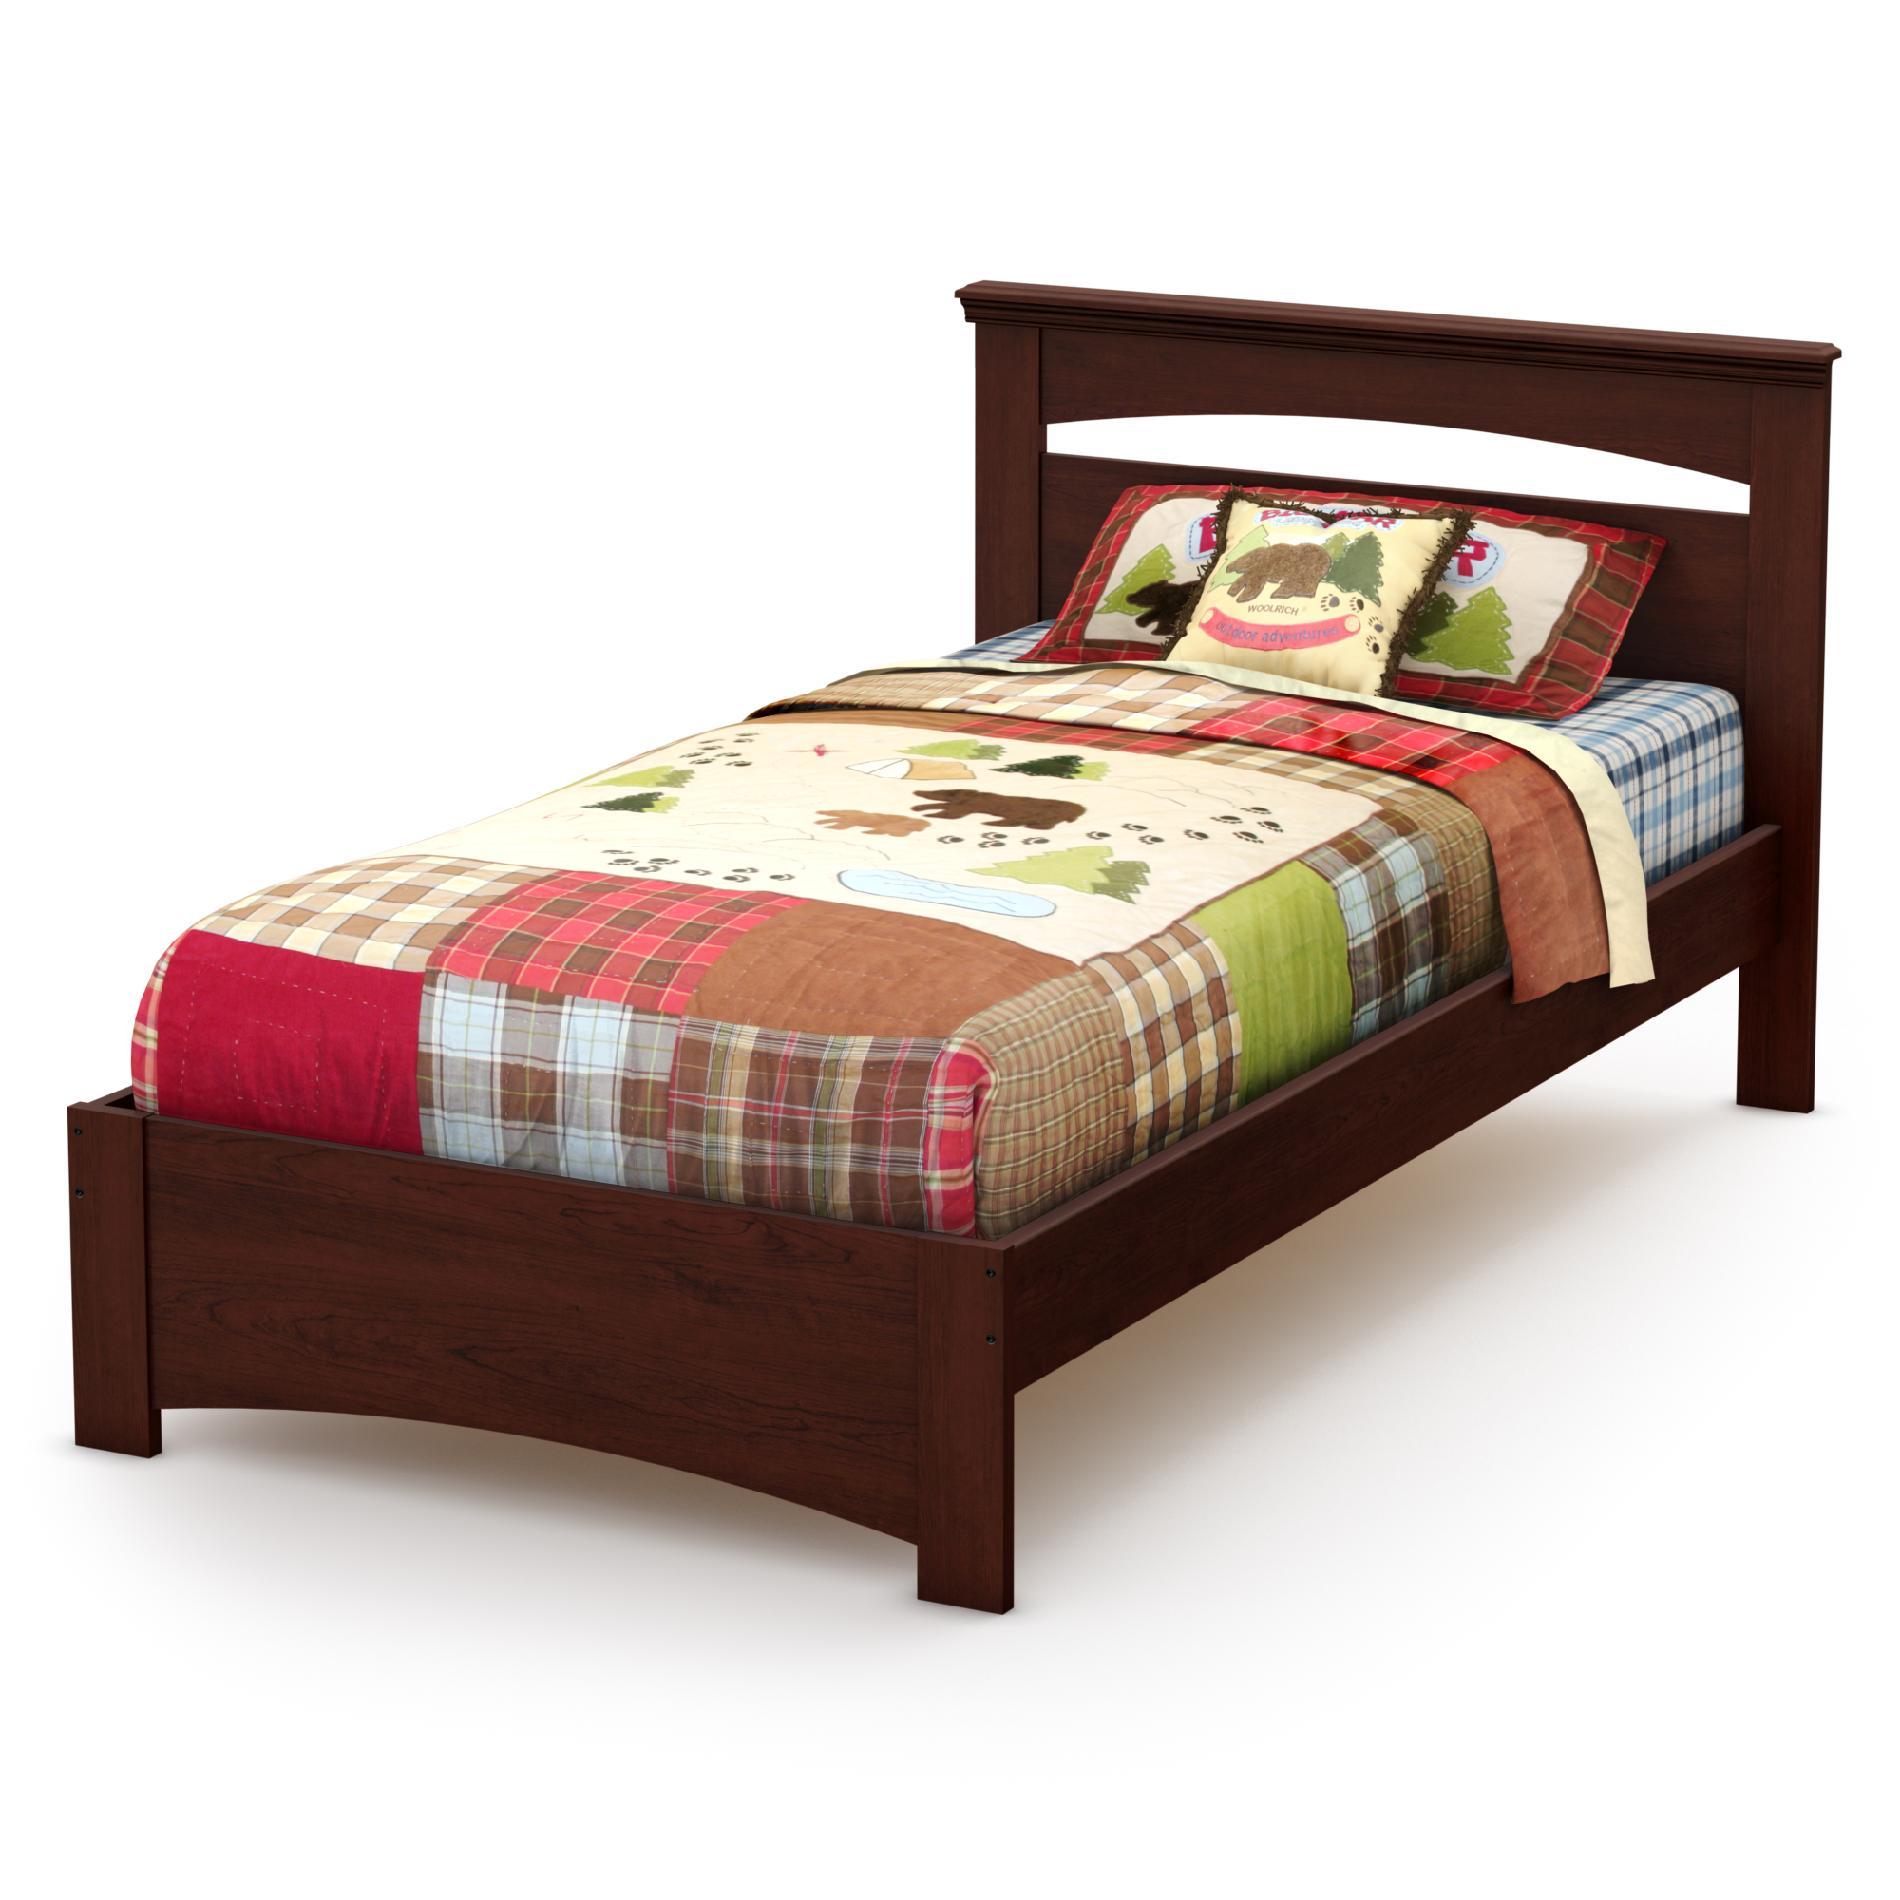 kids' beds | kids' bunk beds - sears